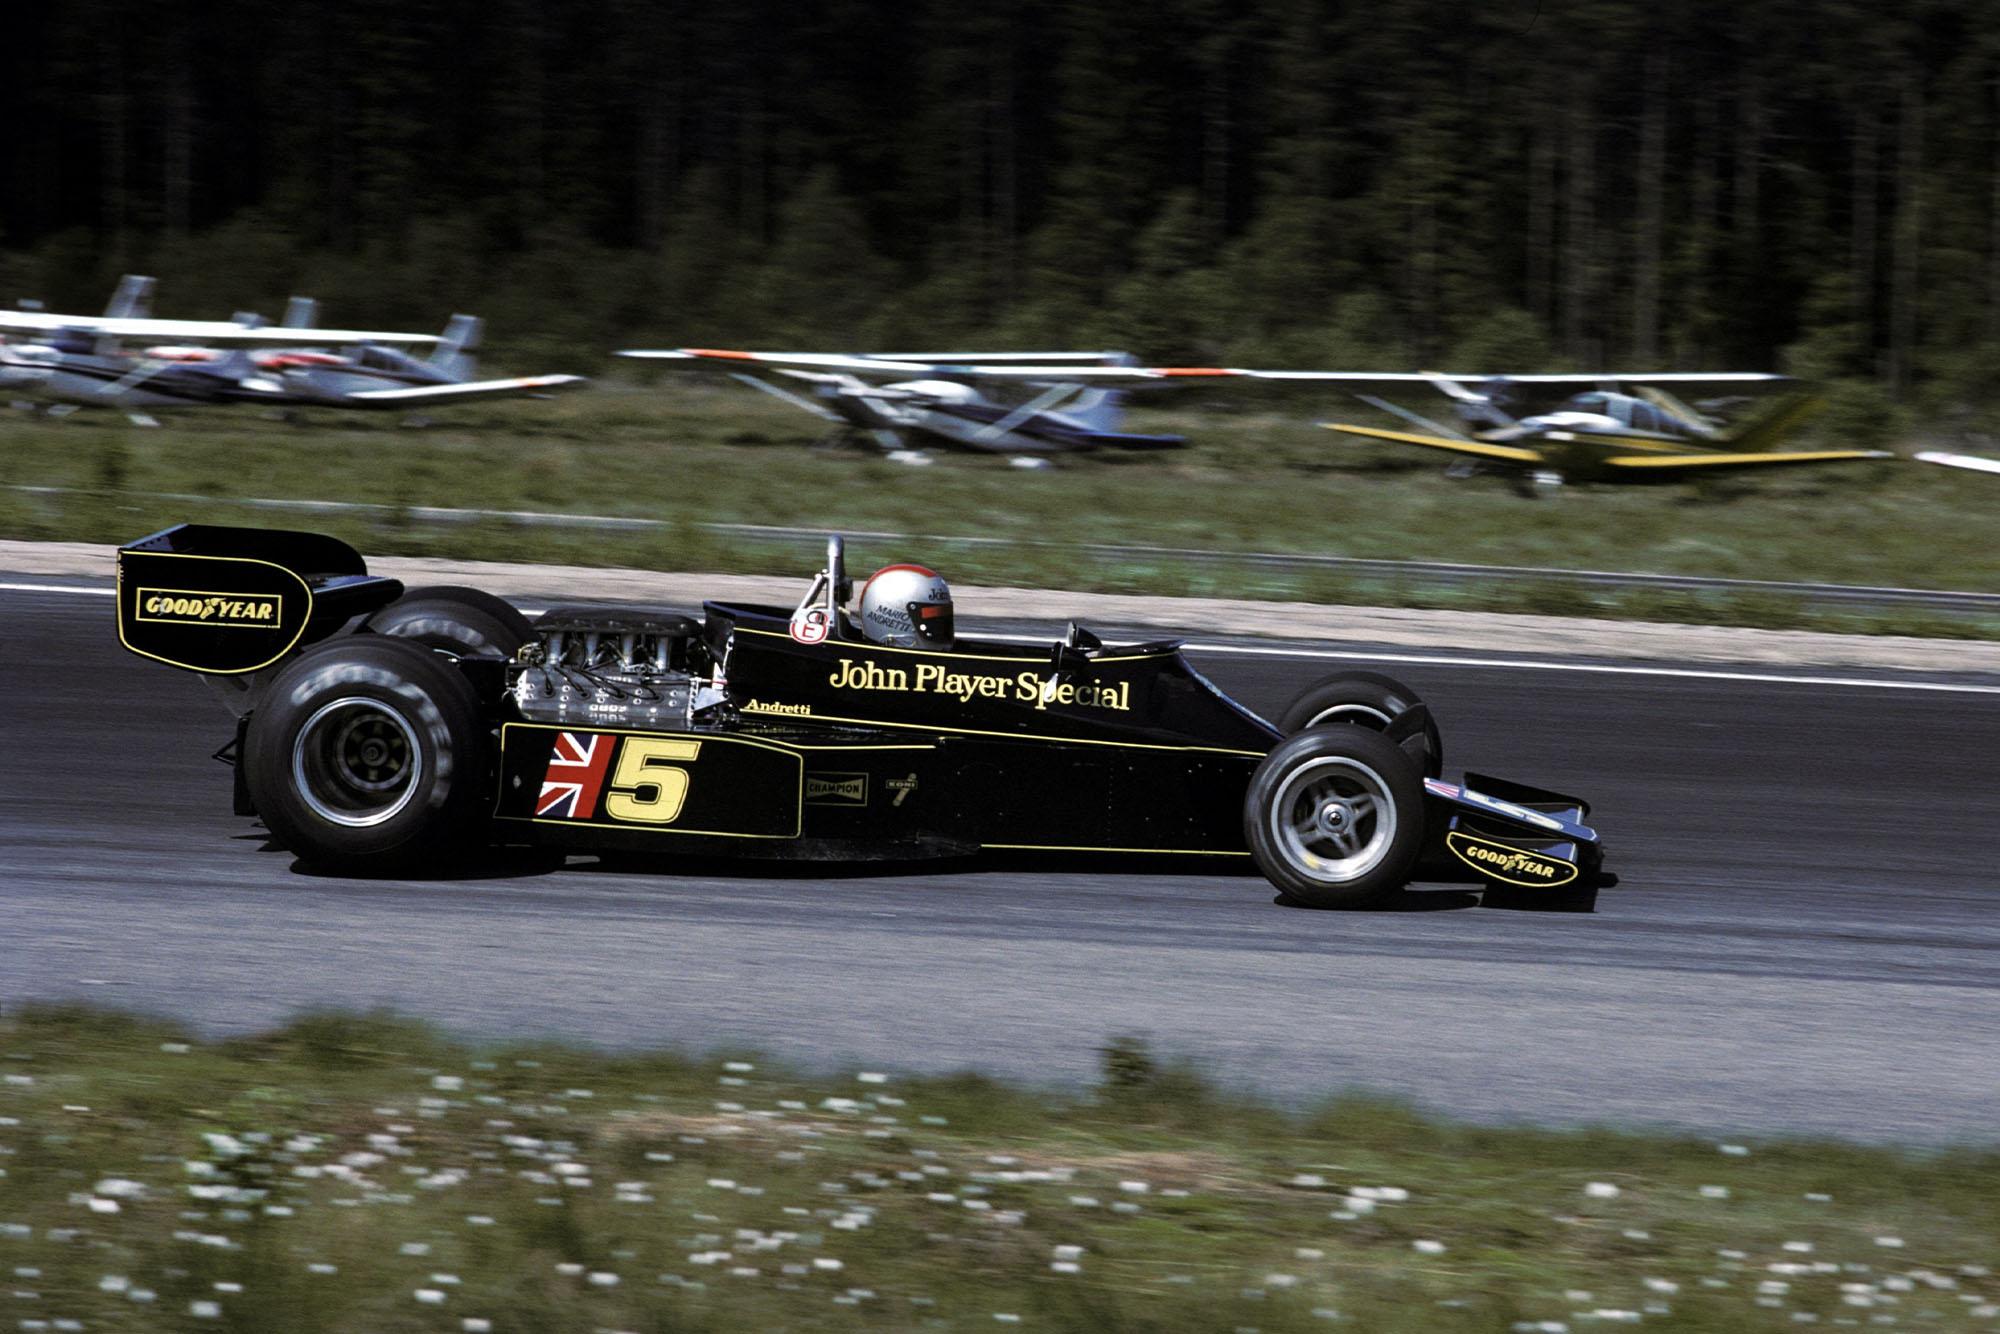 Mario Andretti (Lotus) at the 1976 Swedish Grand Prix, Anderstorp.